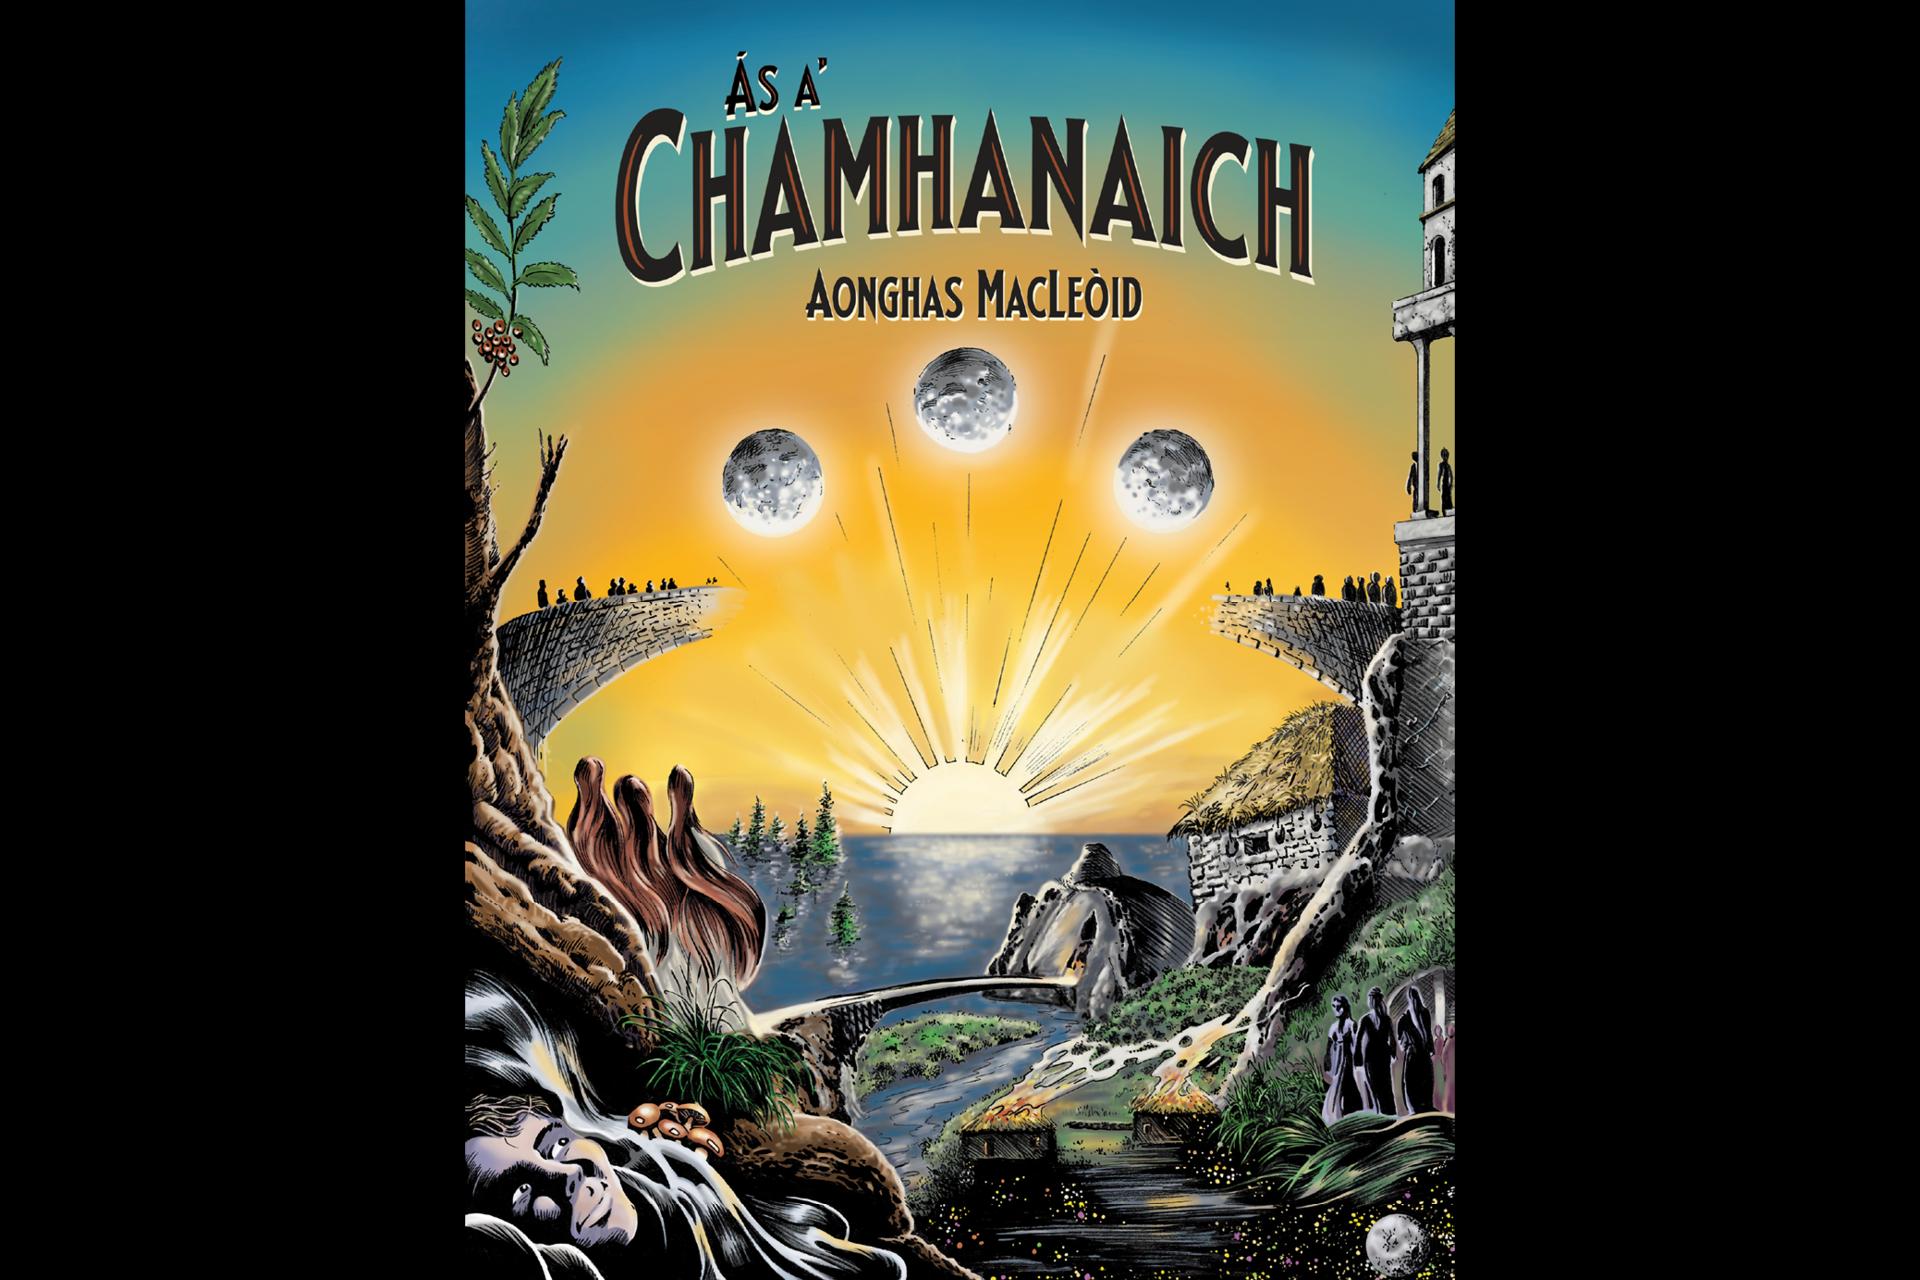 Ás a' Chamhanaich, a Gaelic graphic novel by Angus MacLeod of Cape Breton